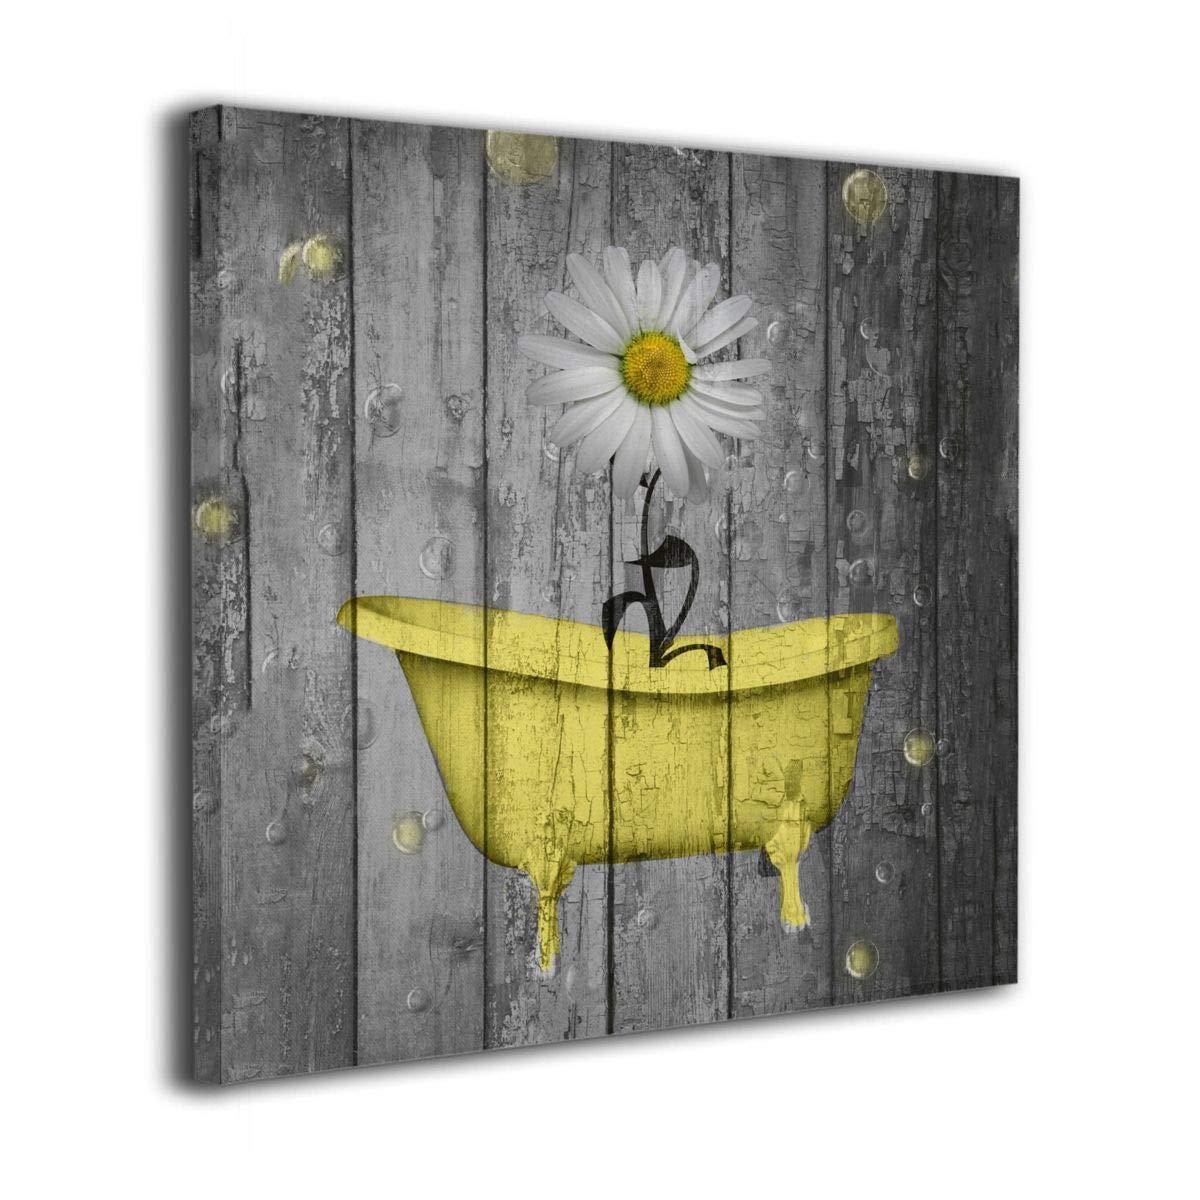 Okoart canvas wall art prints yellow gray daisy flower bubbles rustic farmhouse photo paintings modern decorative giclee artwork wall decor wood frame